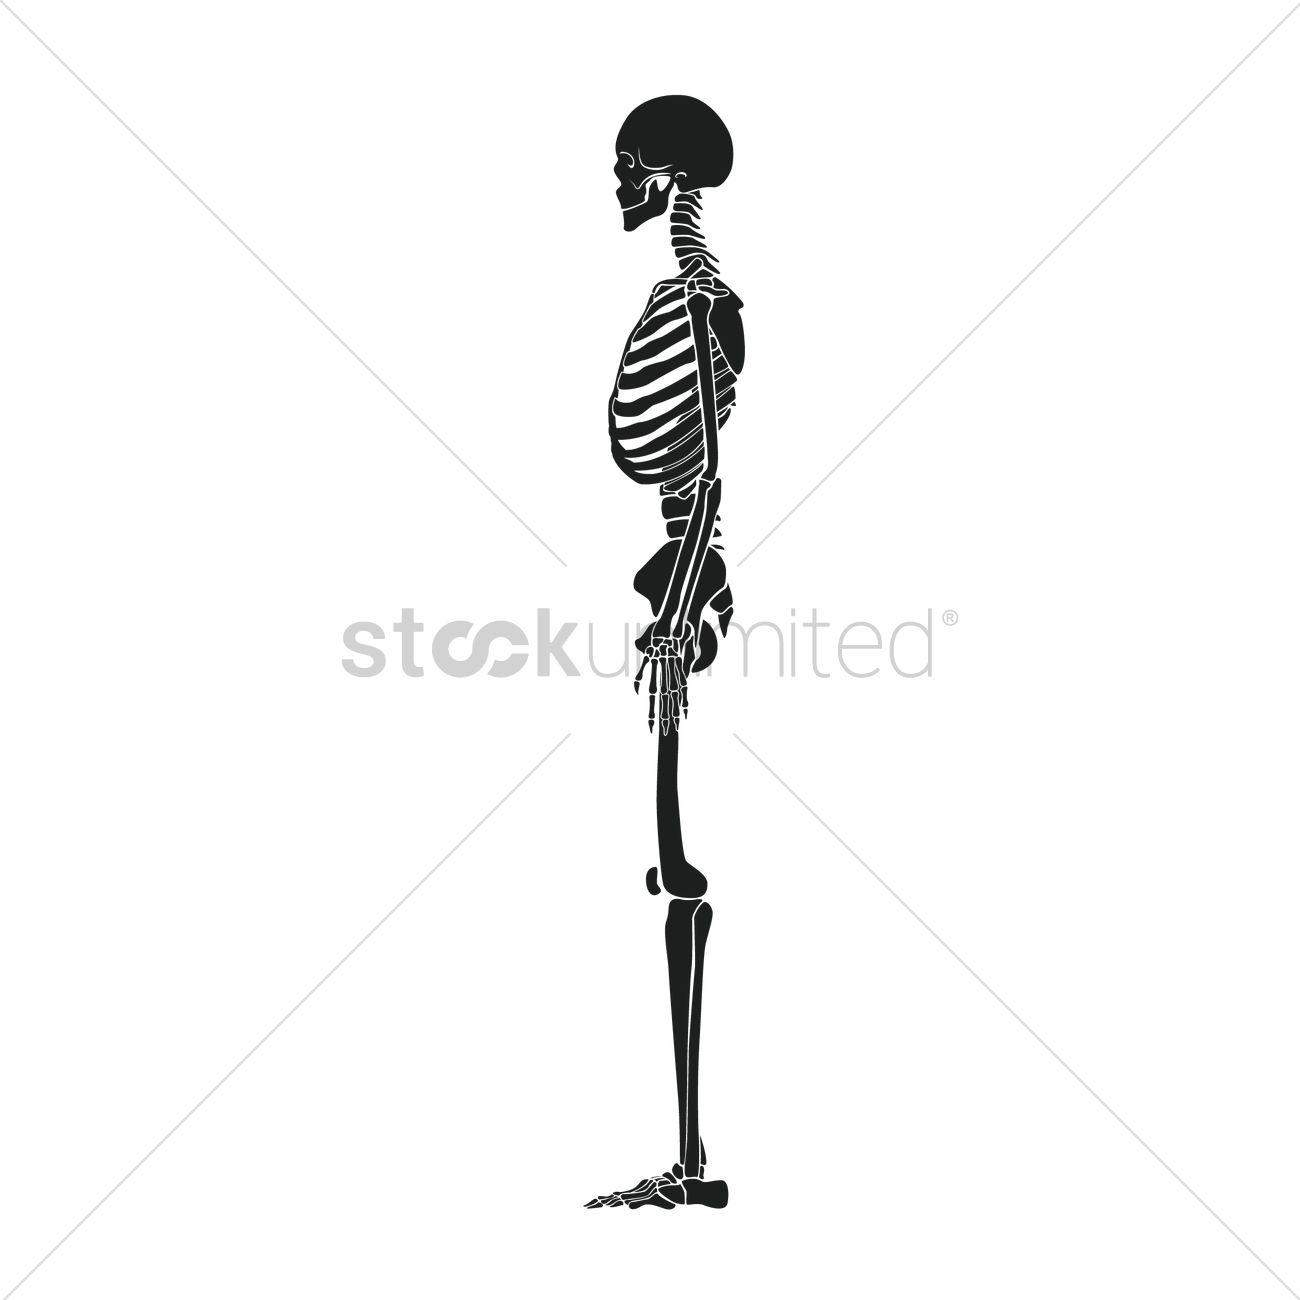 side view of human skeleton vector image - 1516129 | stockunlimited, Skeleton